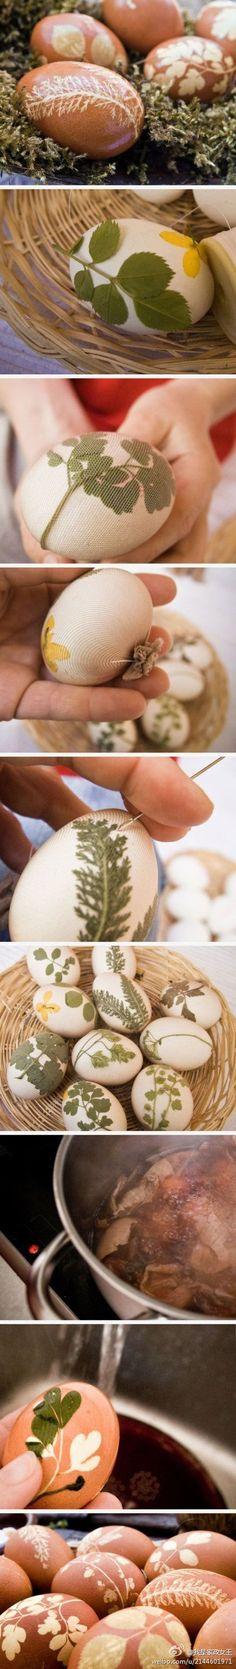 pretty prints on eggs